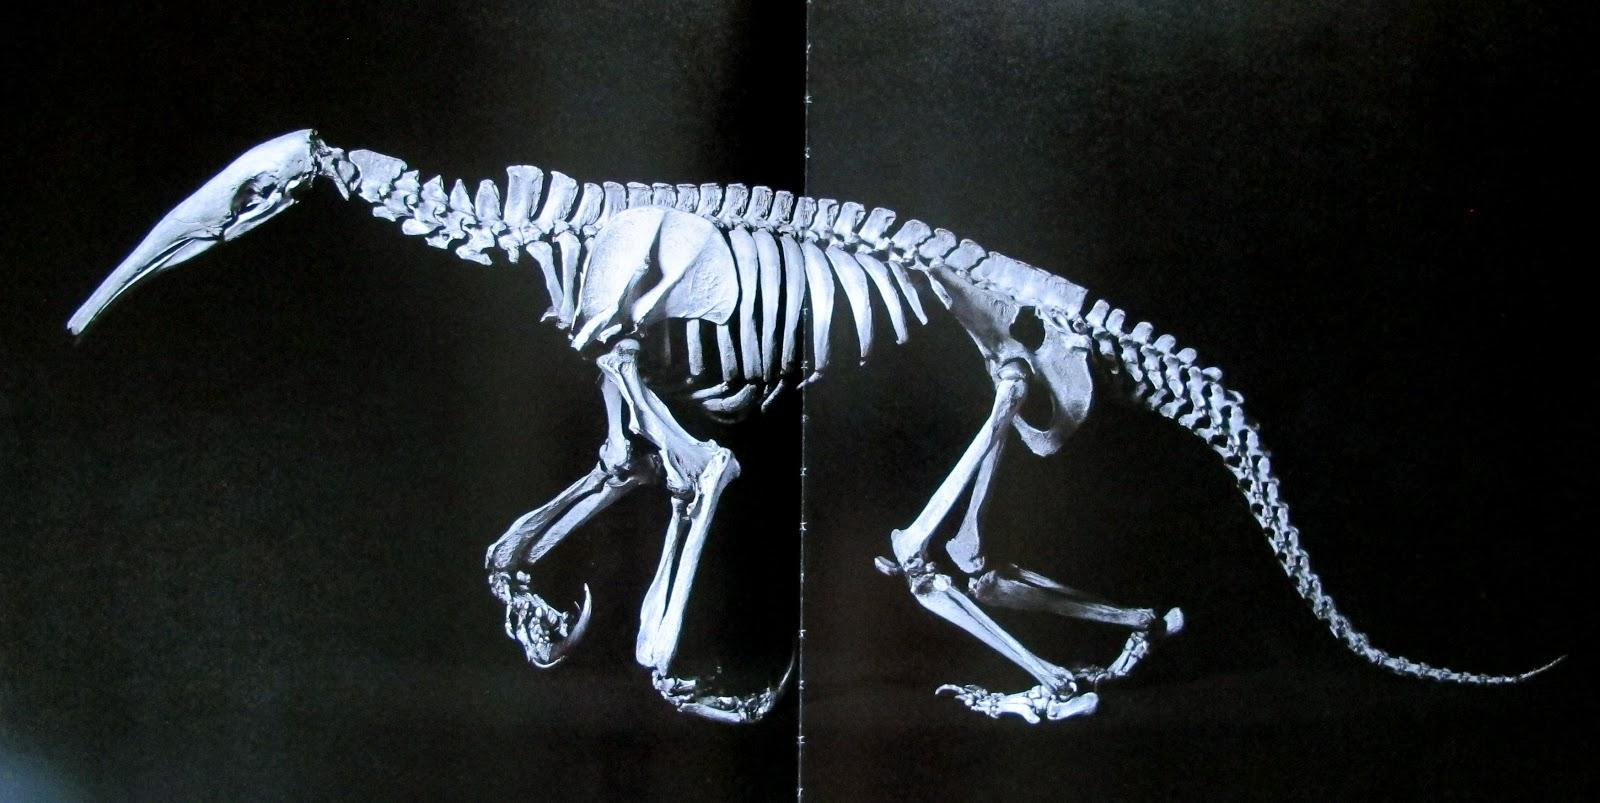 Aardvark skeleton - photo#23